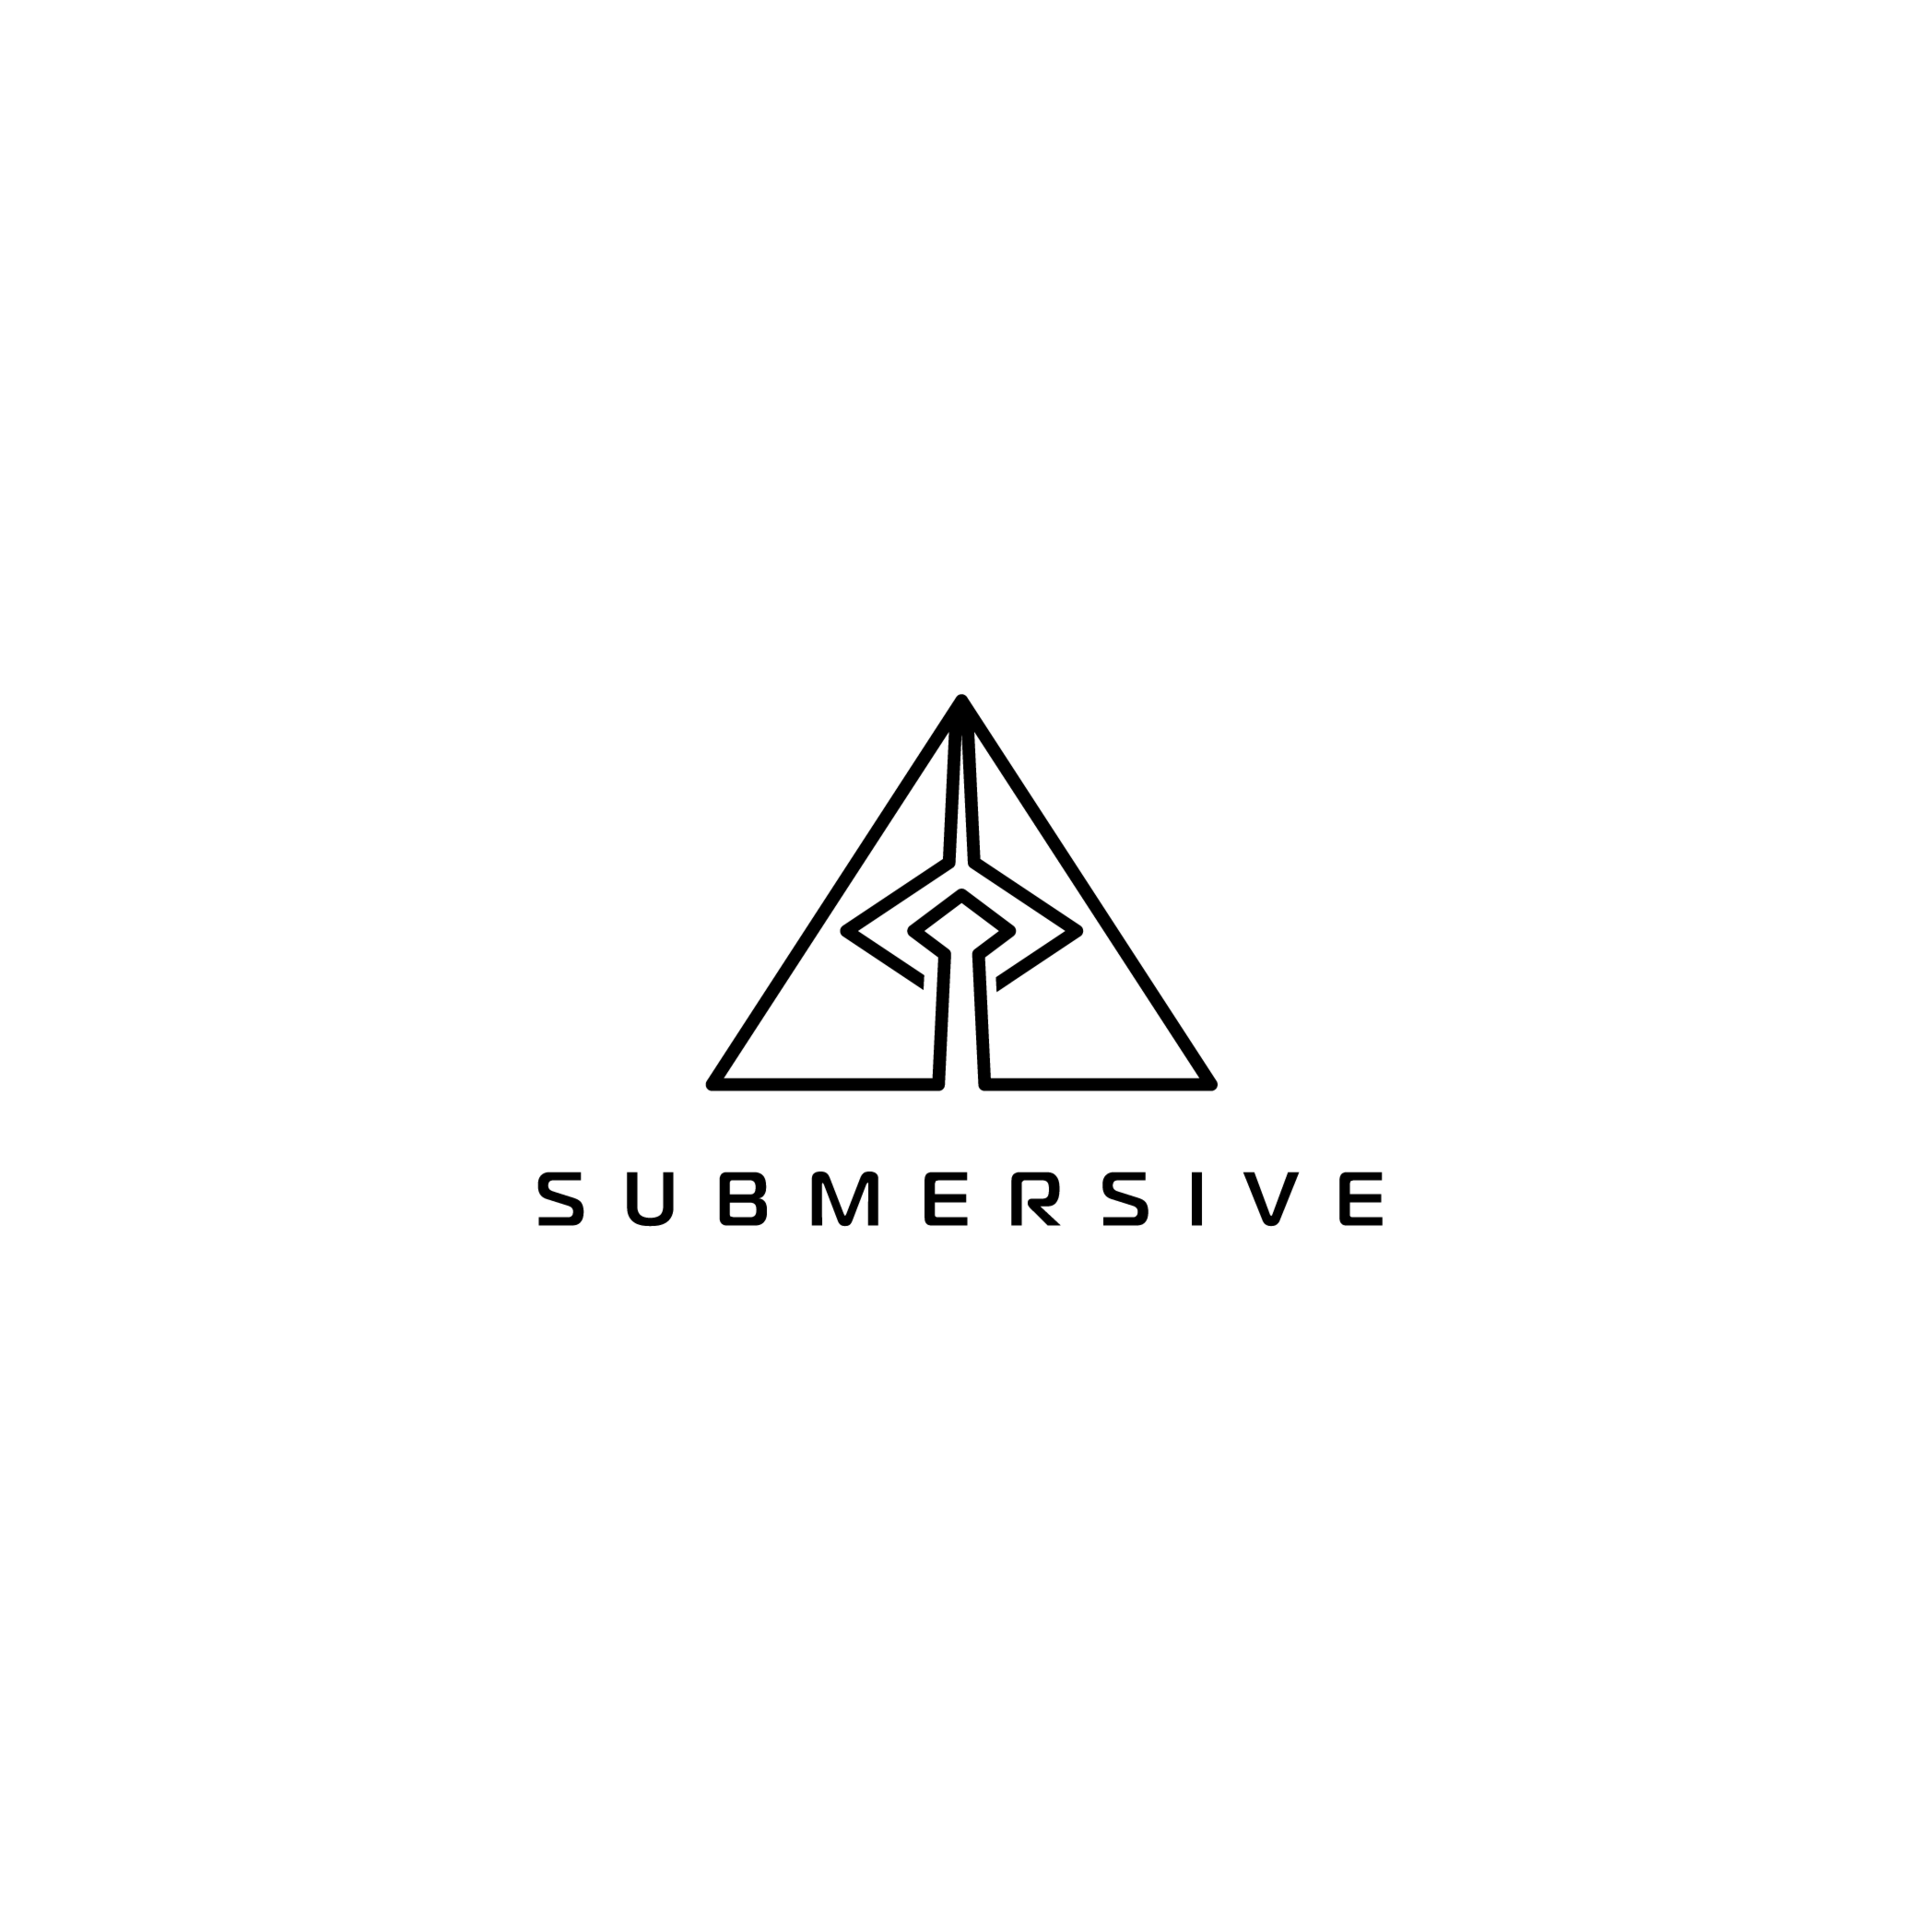 SUBMERCHIVE